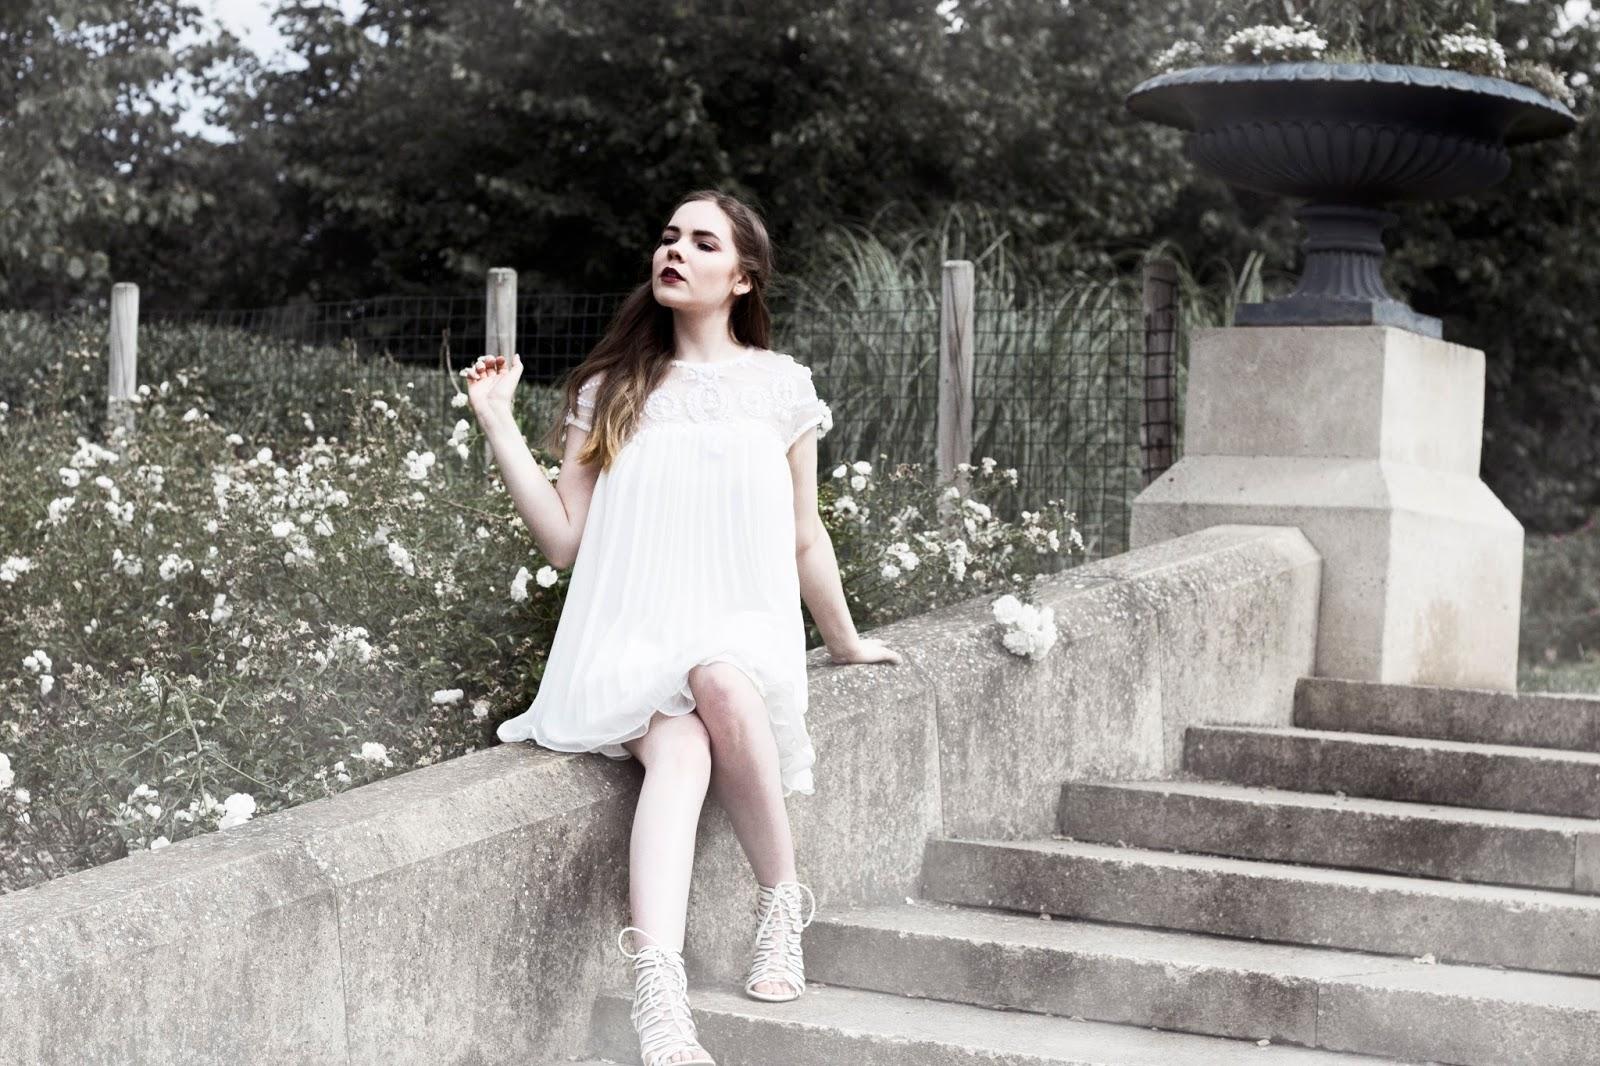 http://www.thewhimsicalwildling.com/2016/10/wonderland-series-white-queen.html